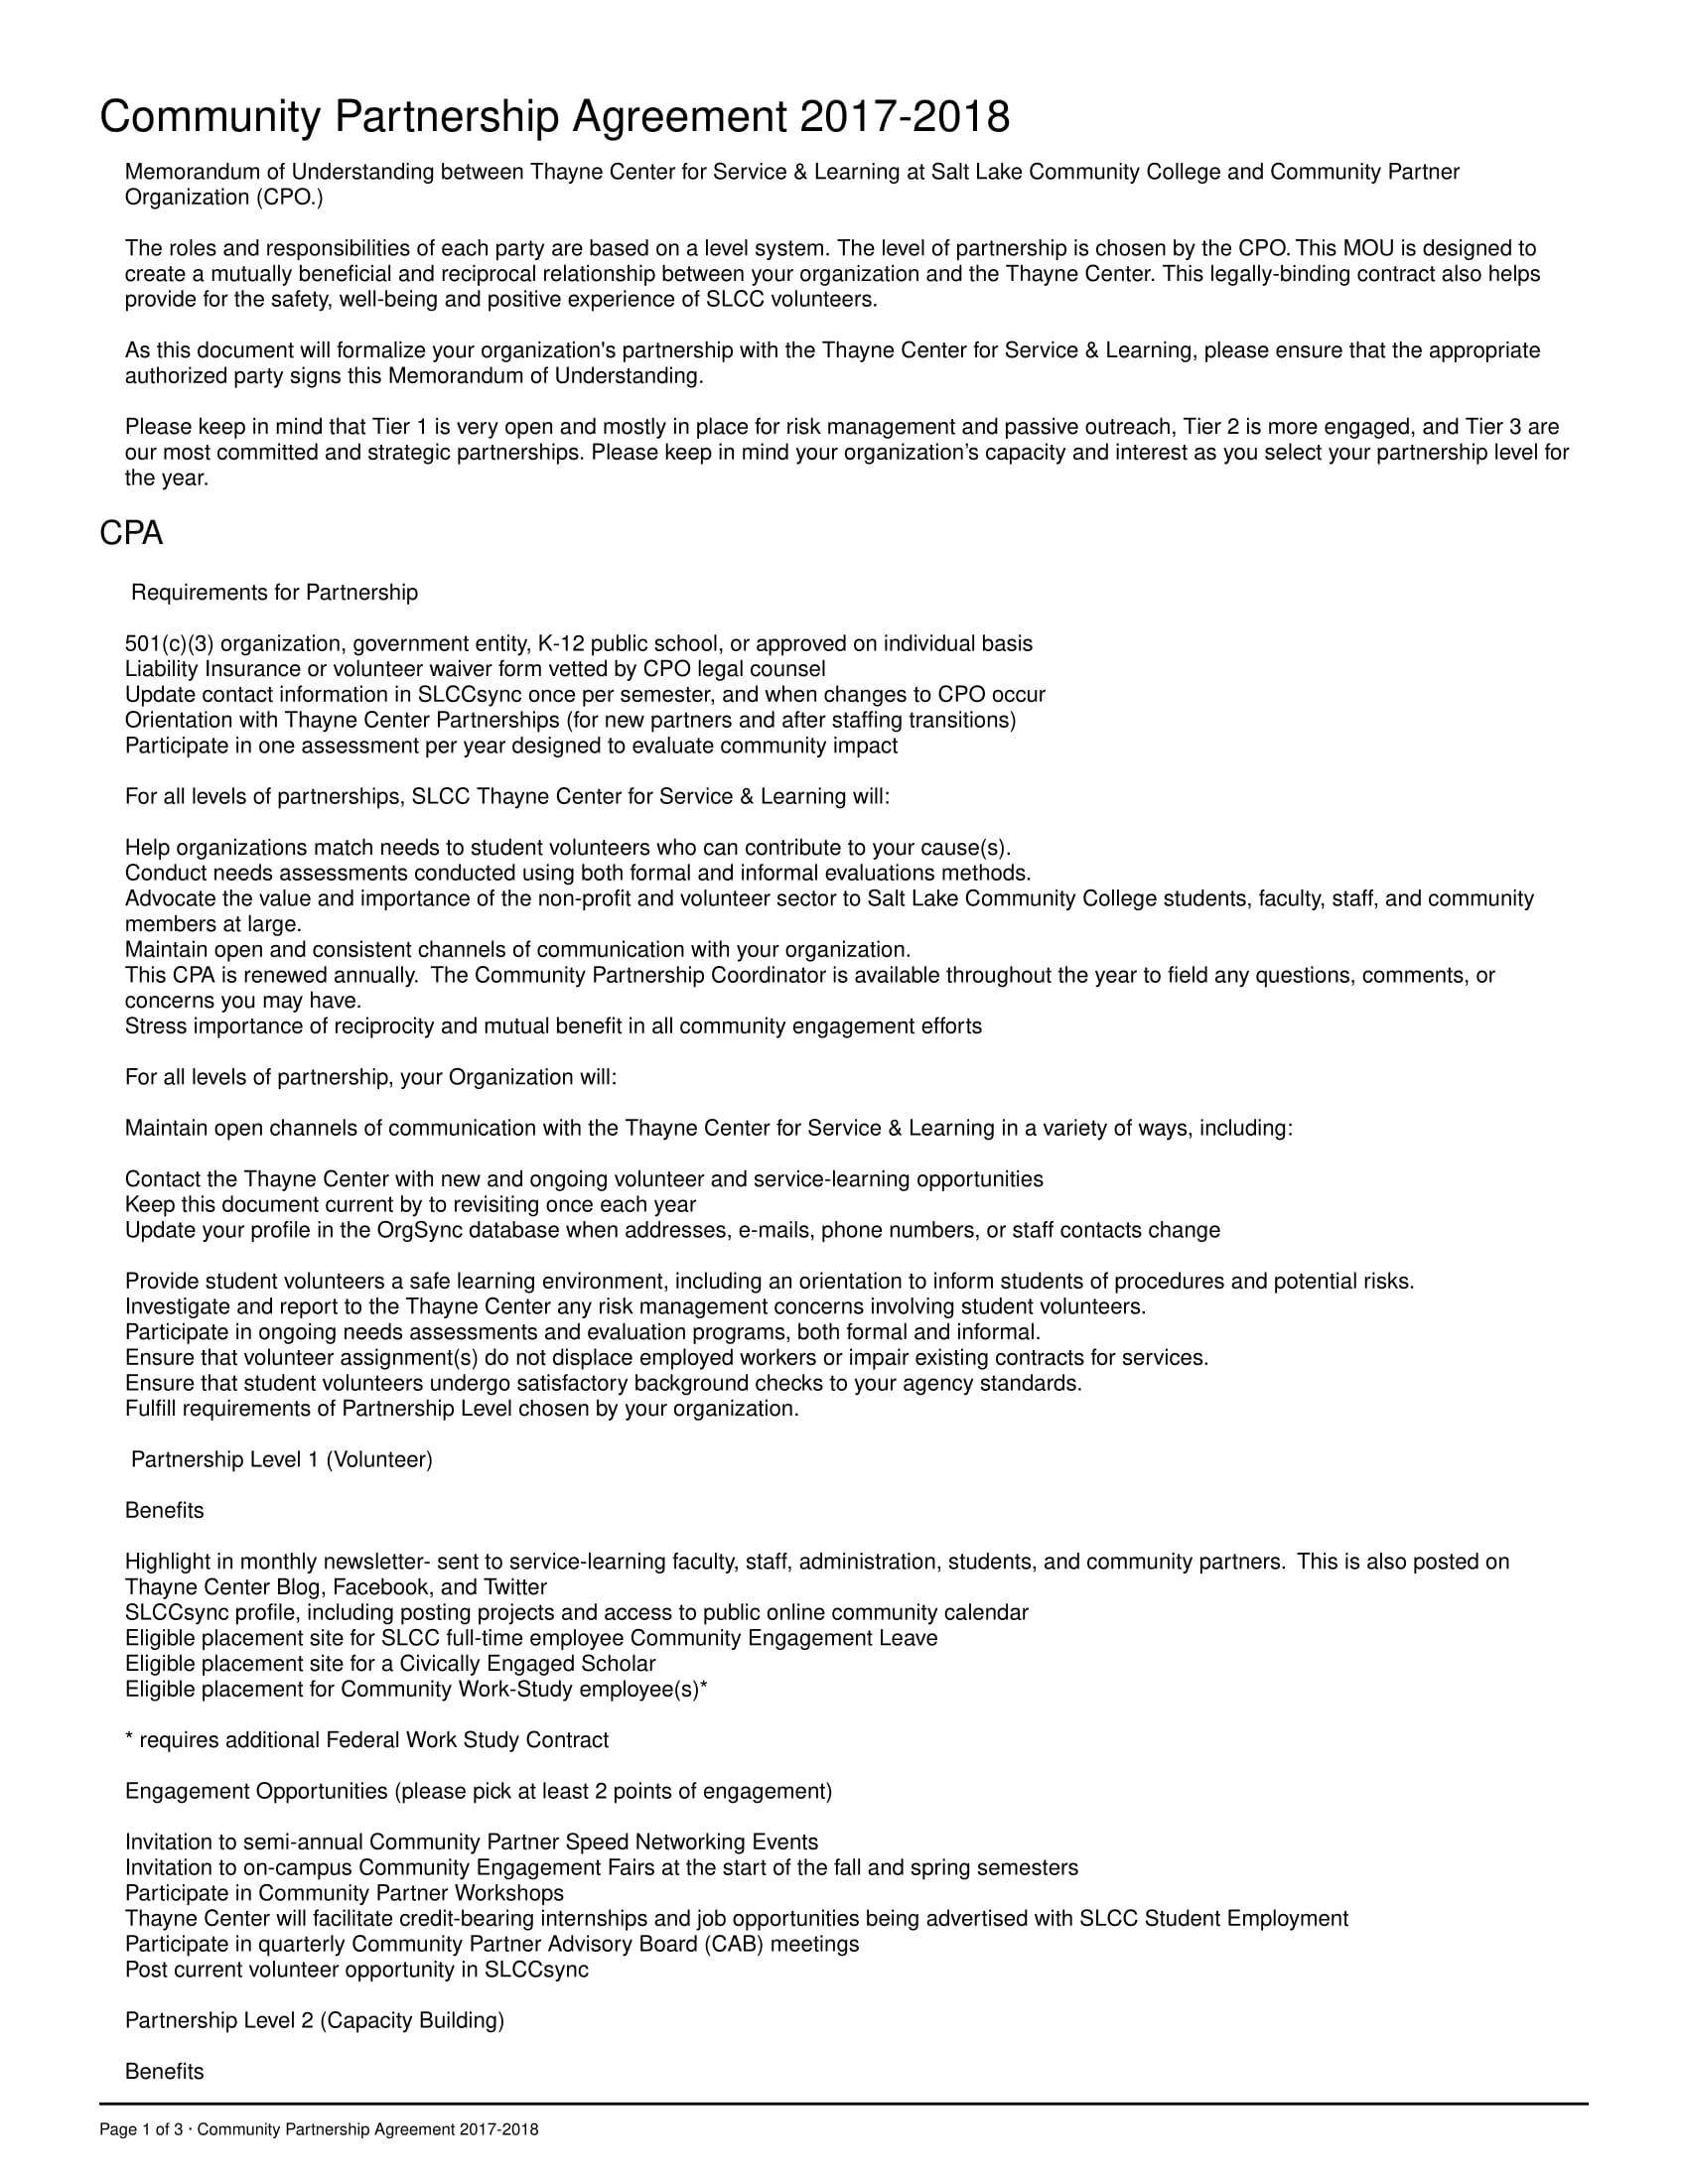 Community Partnership Agreement Example